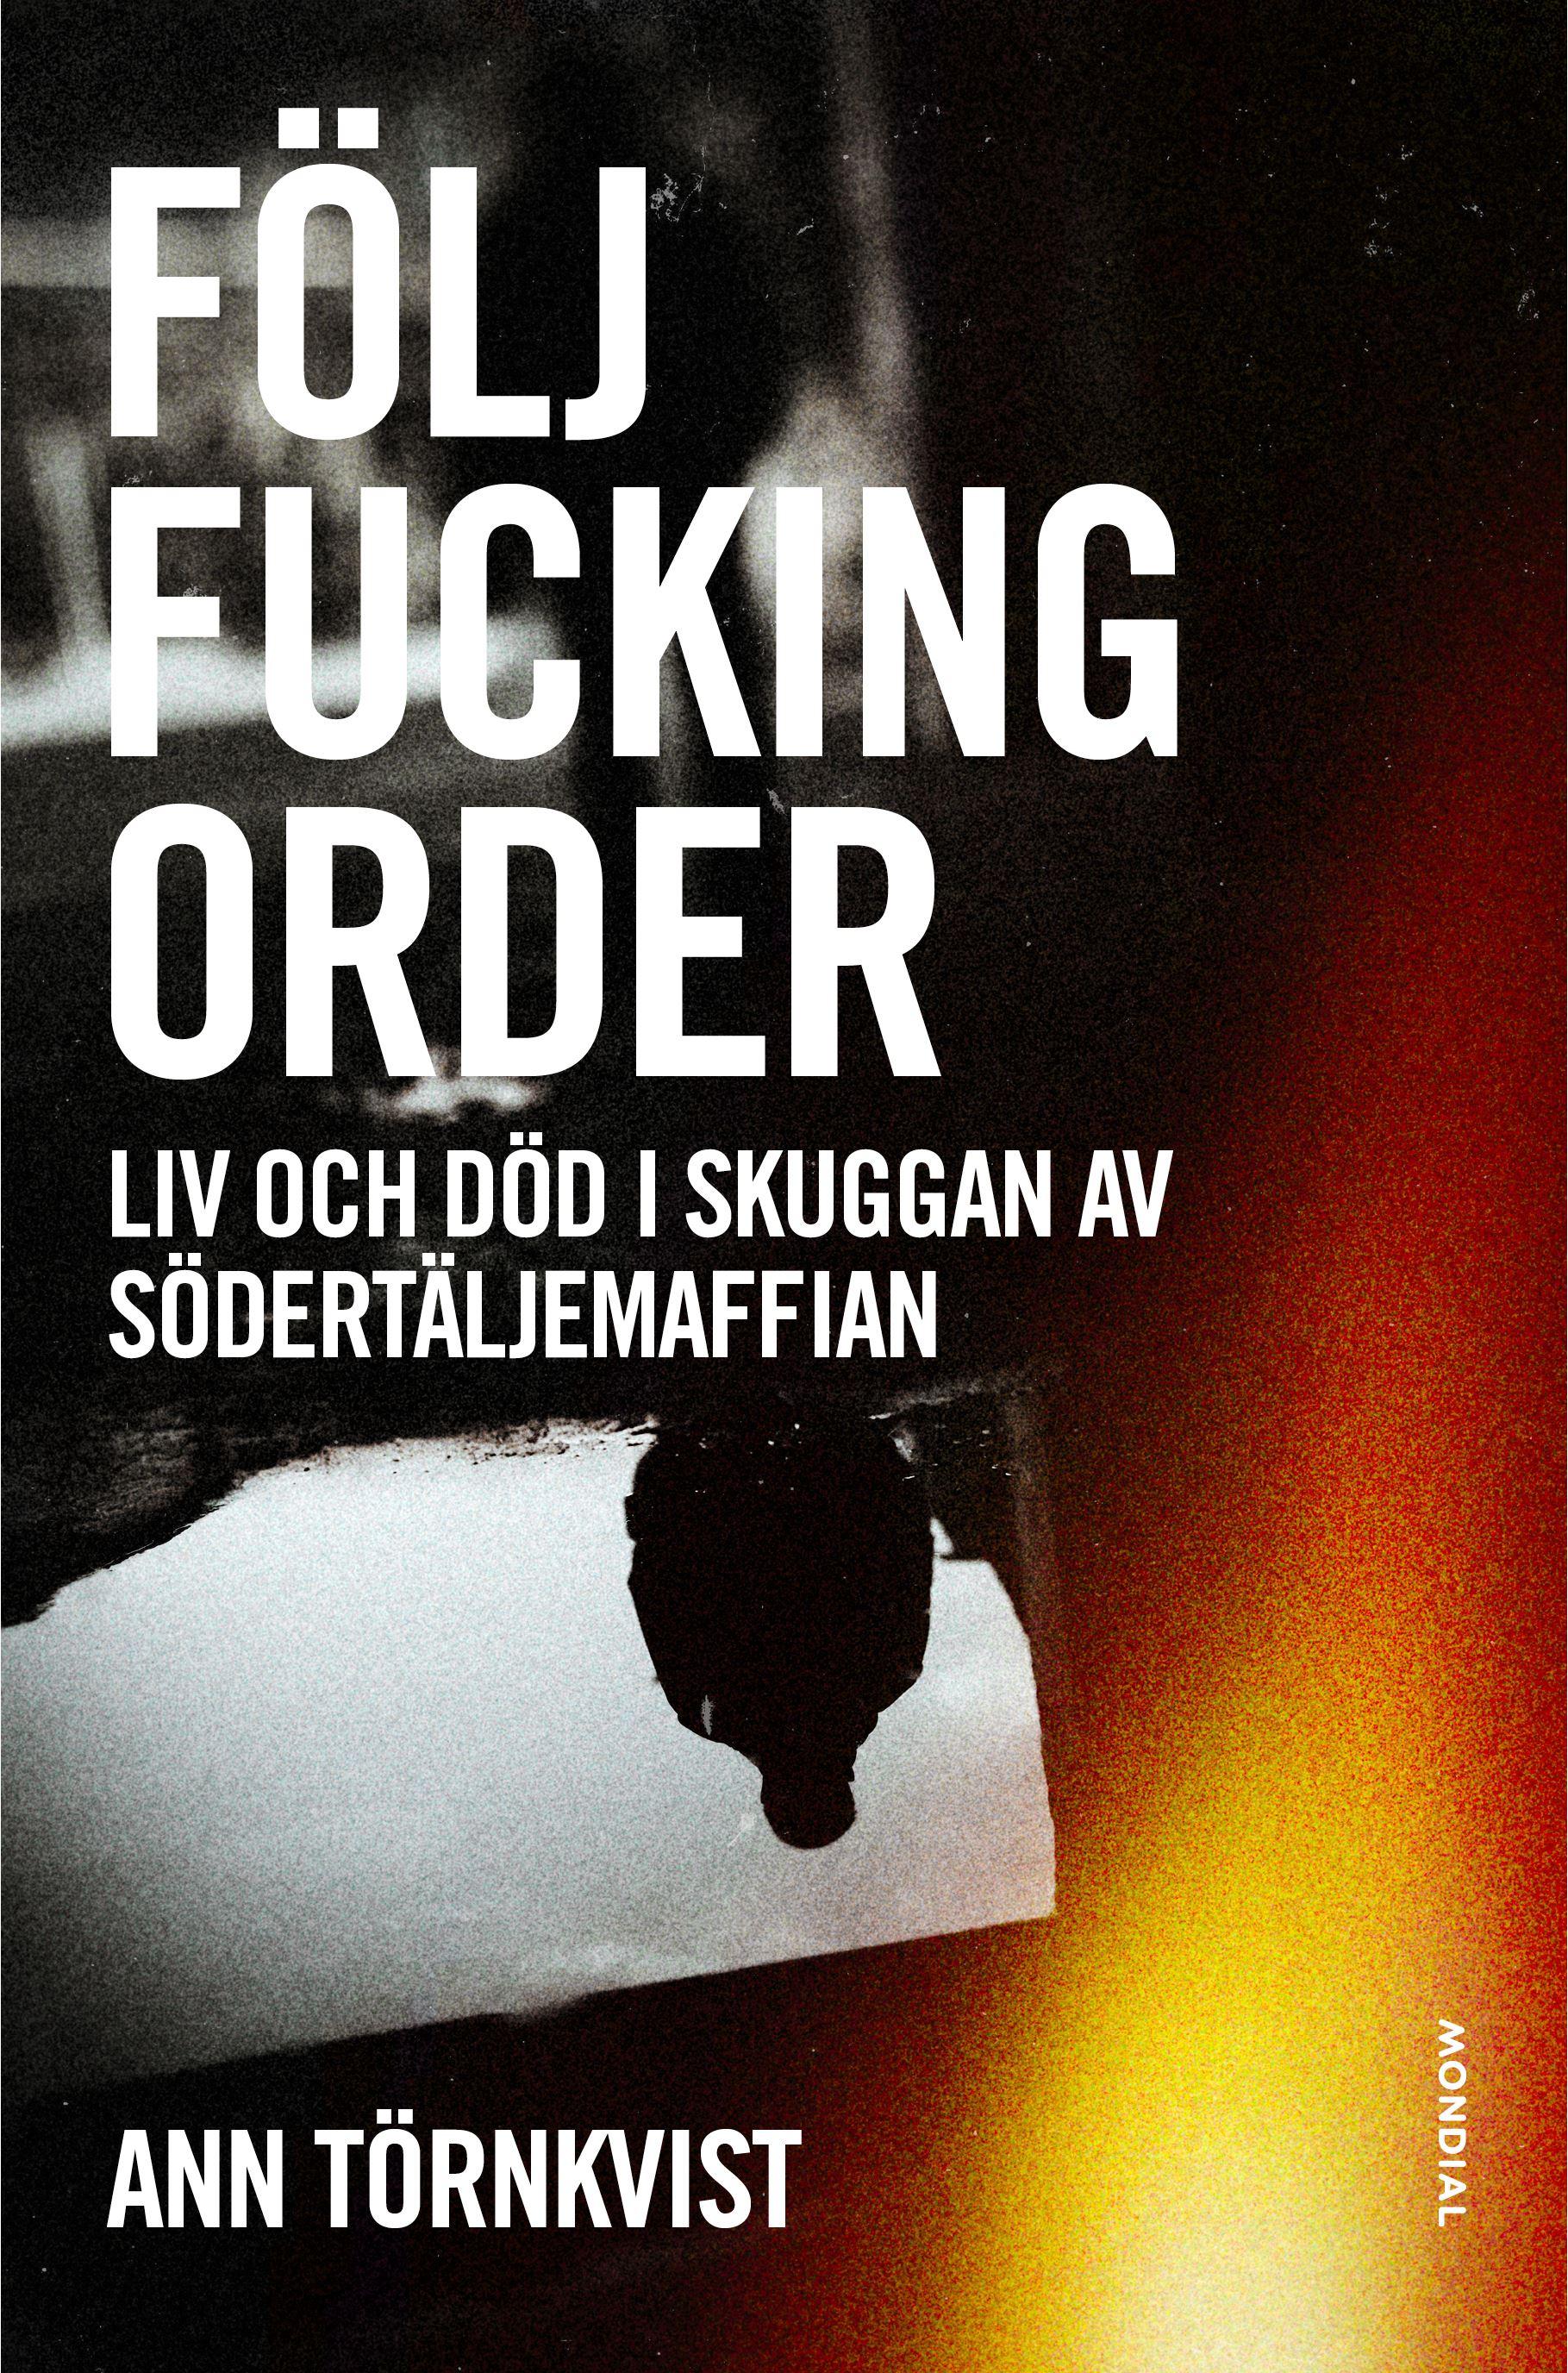 Författarbesök Ann Törnkvist